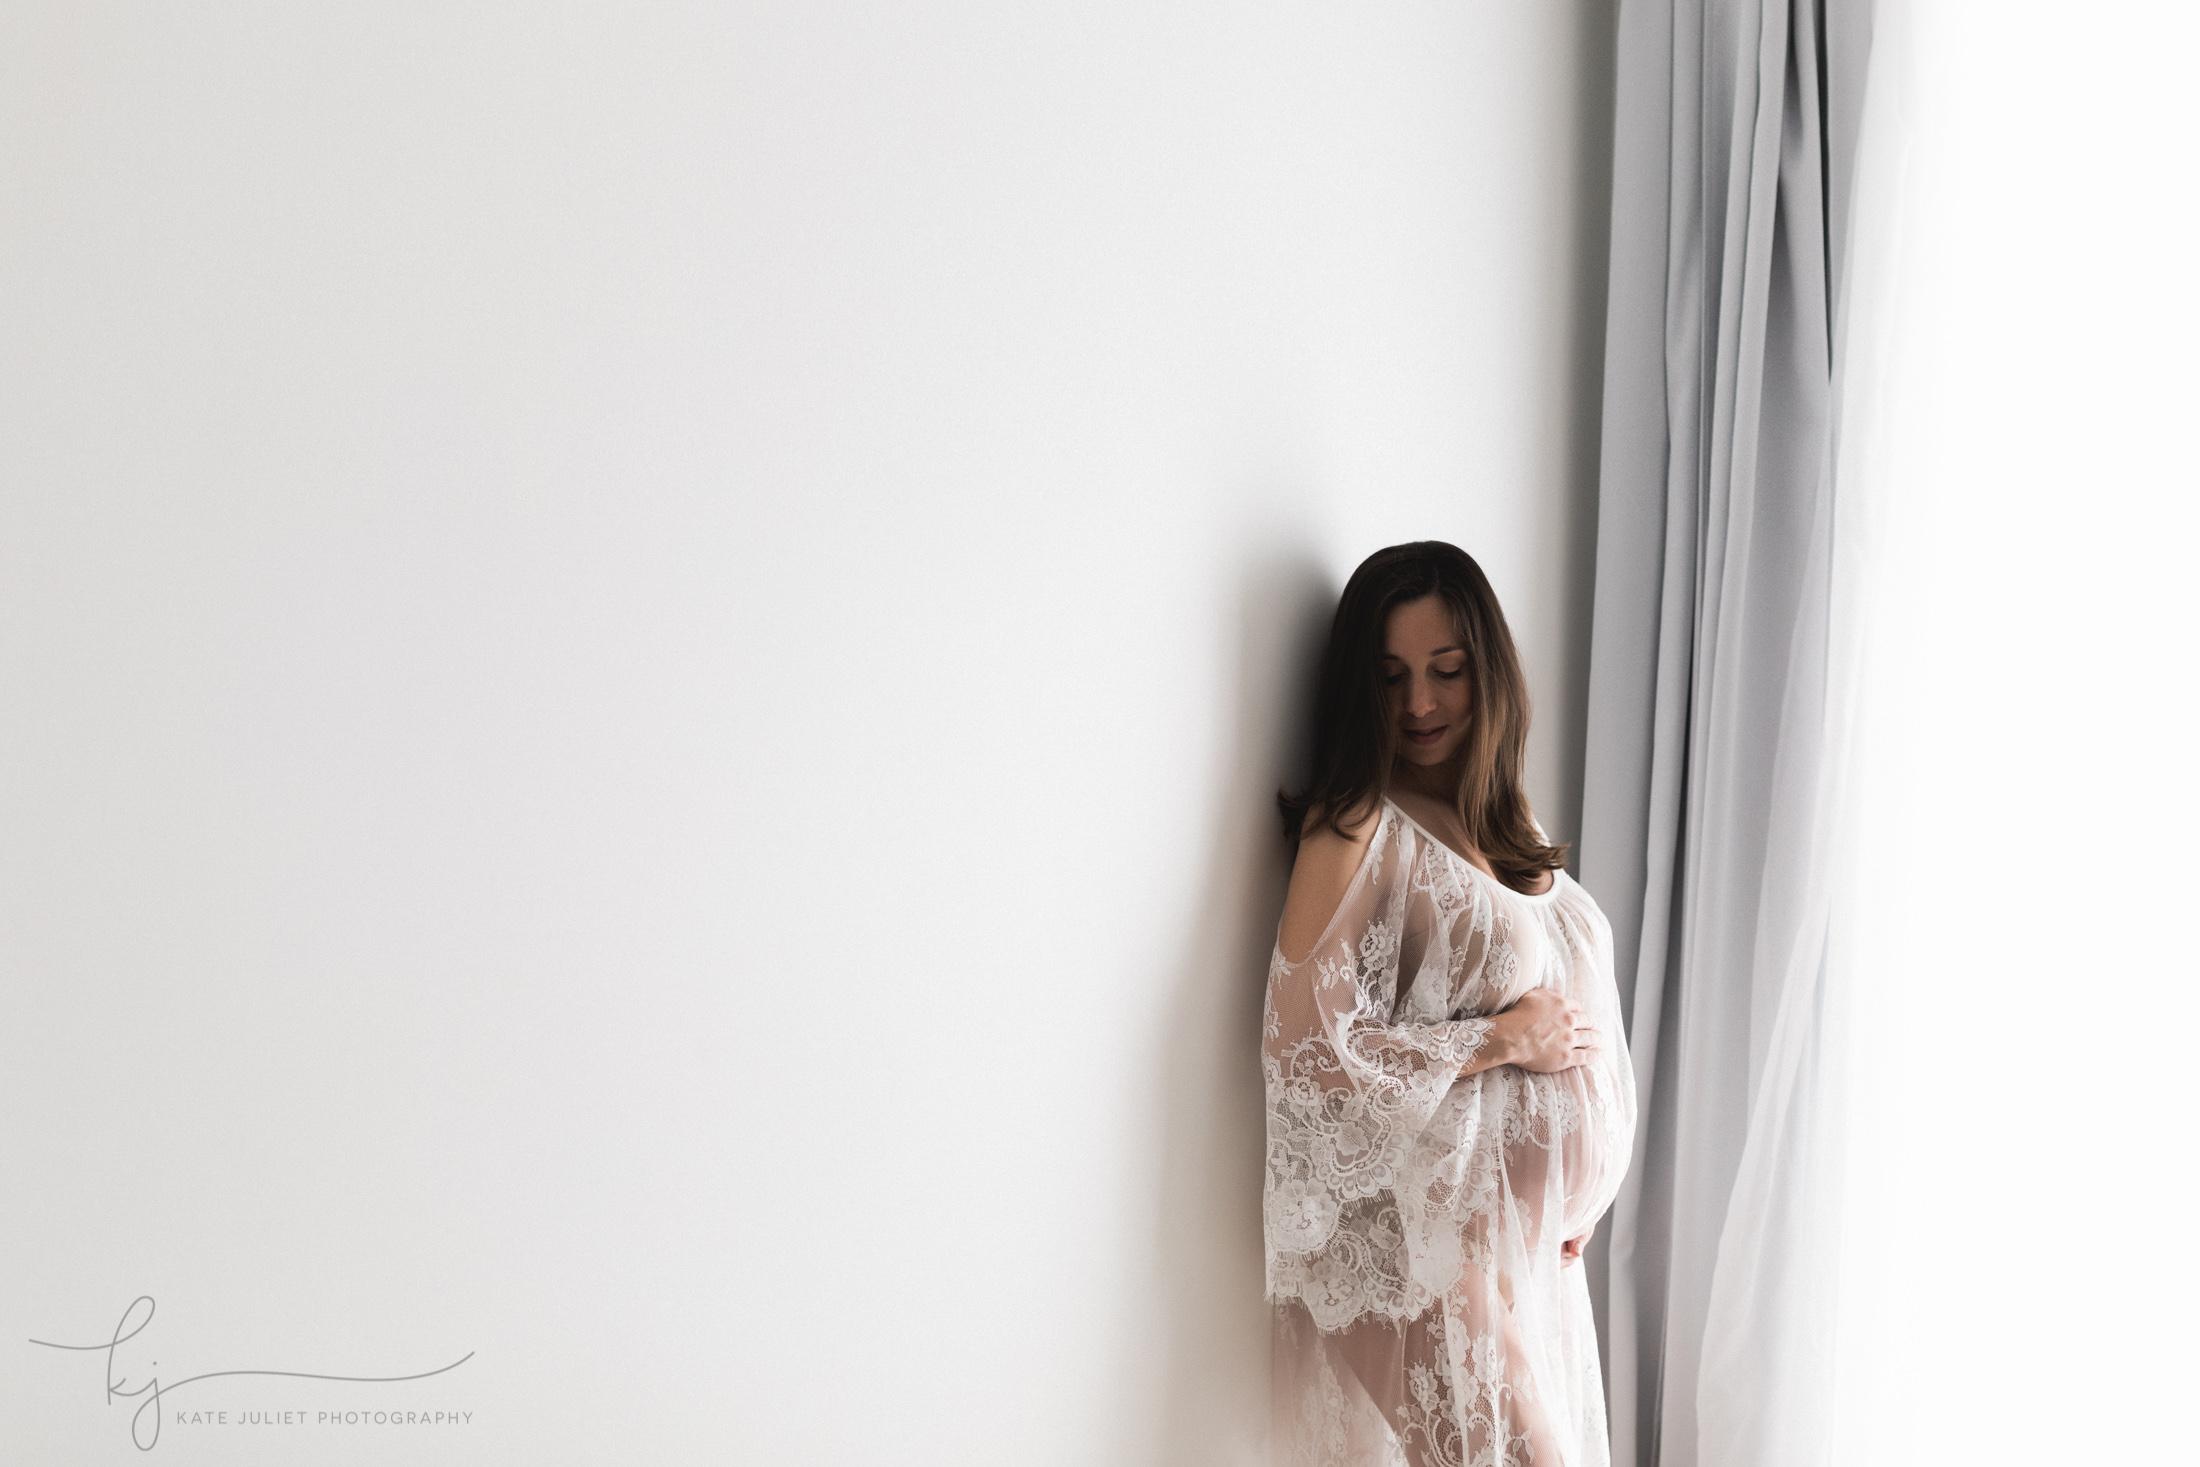 kate_juliet_photography_maternity_mg_web-17.jpg